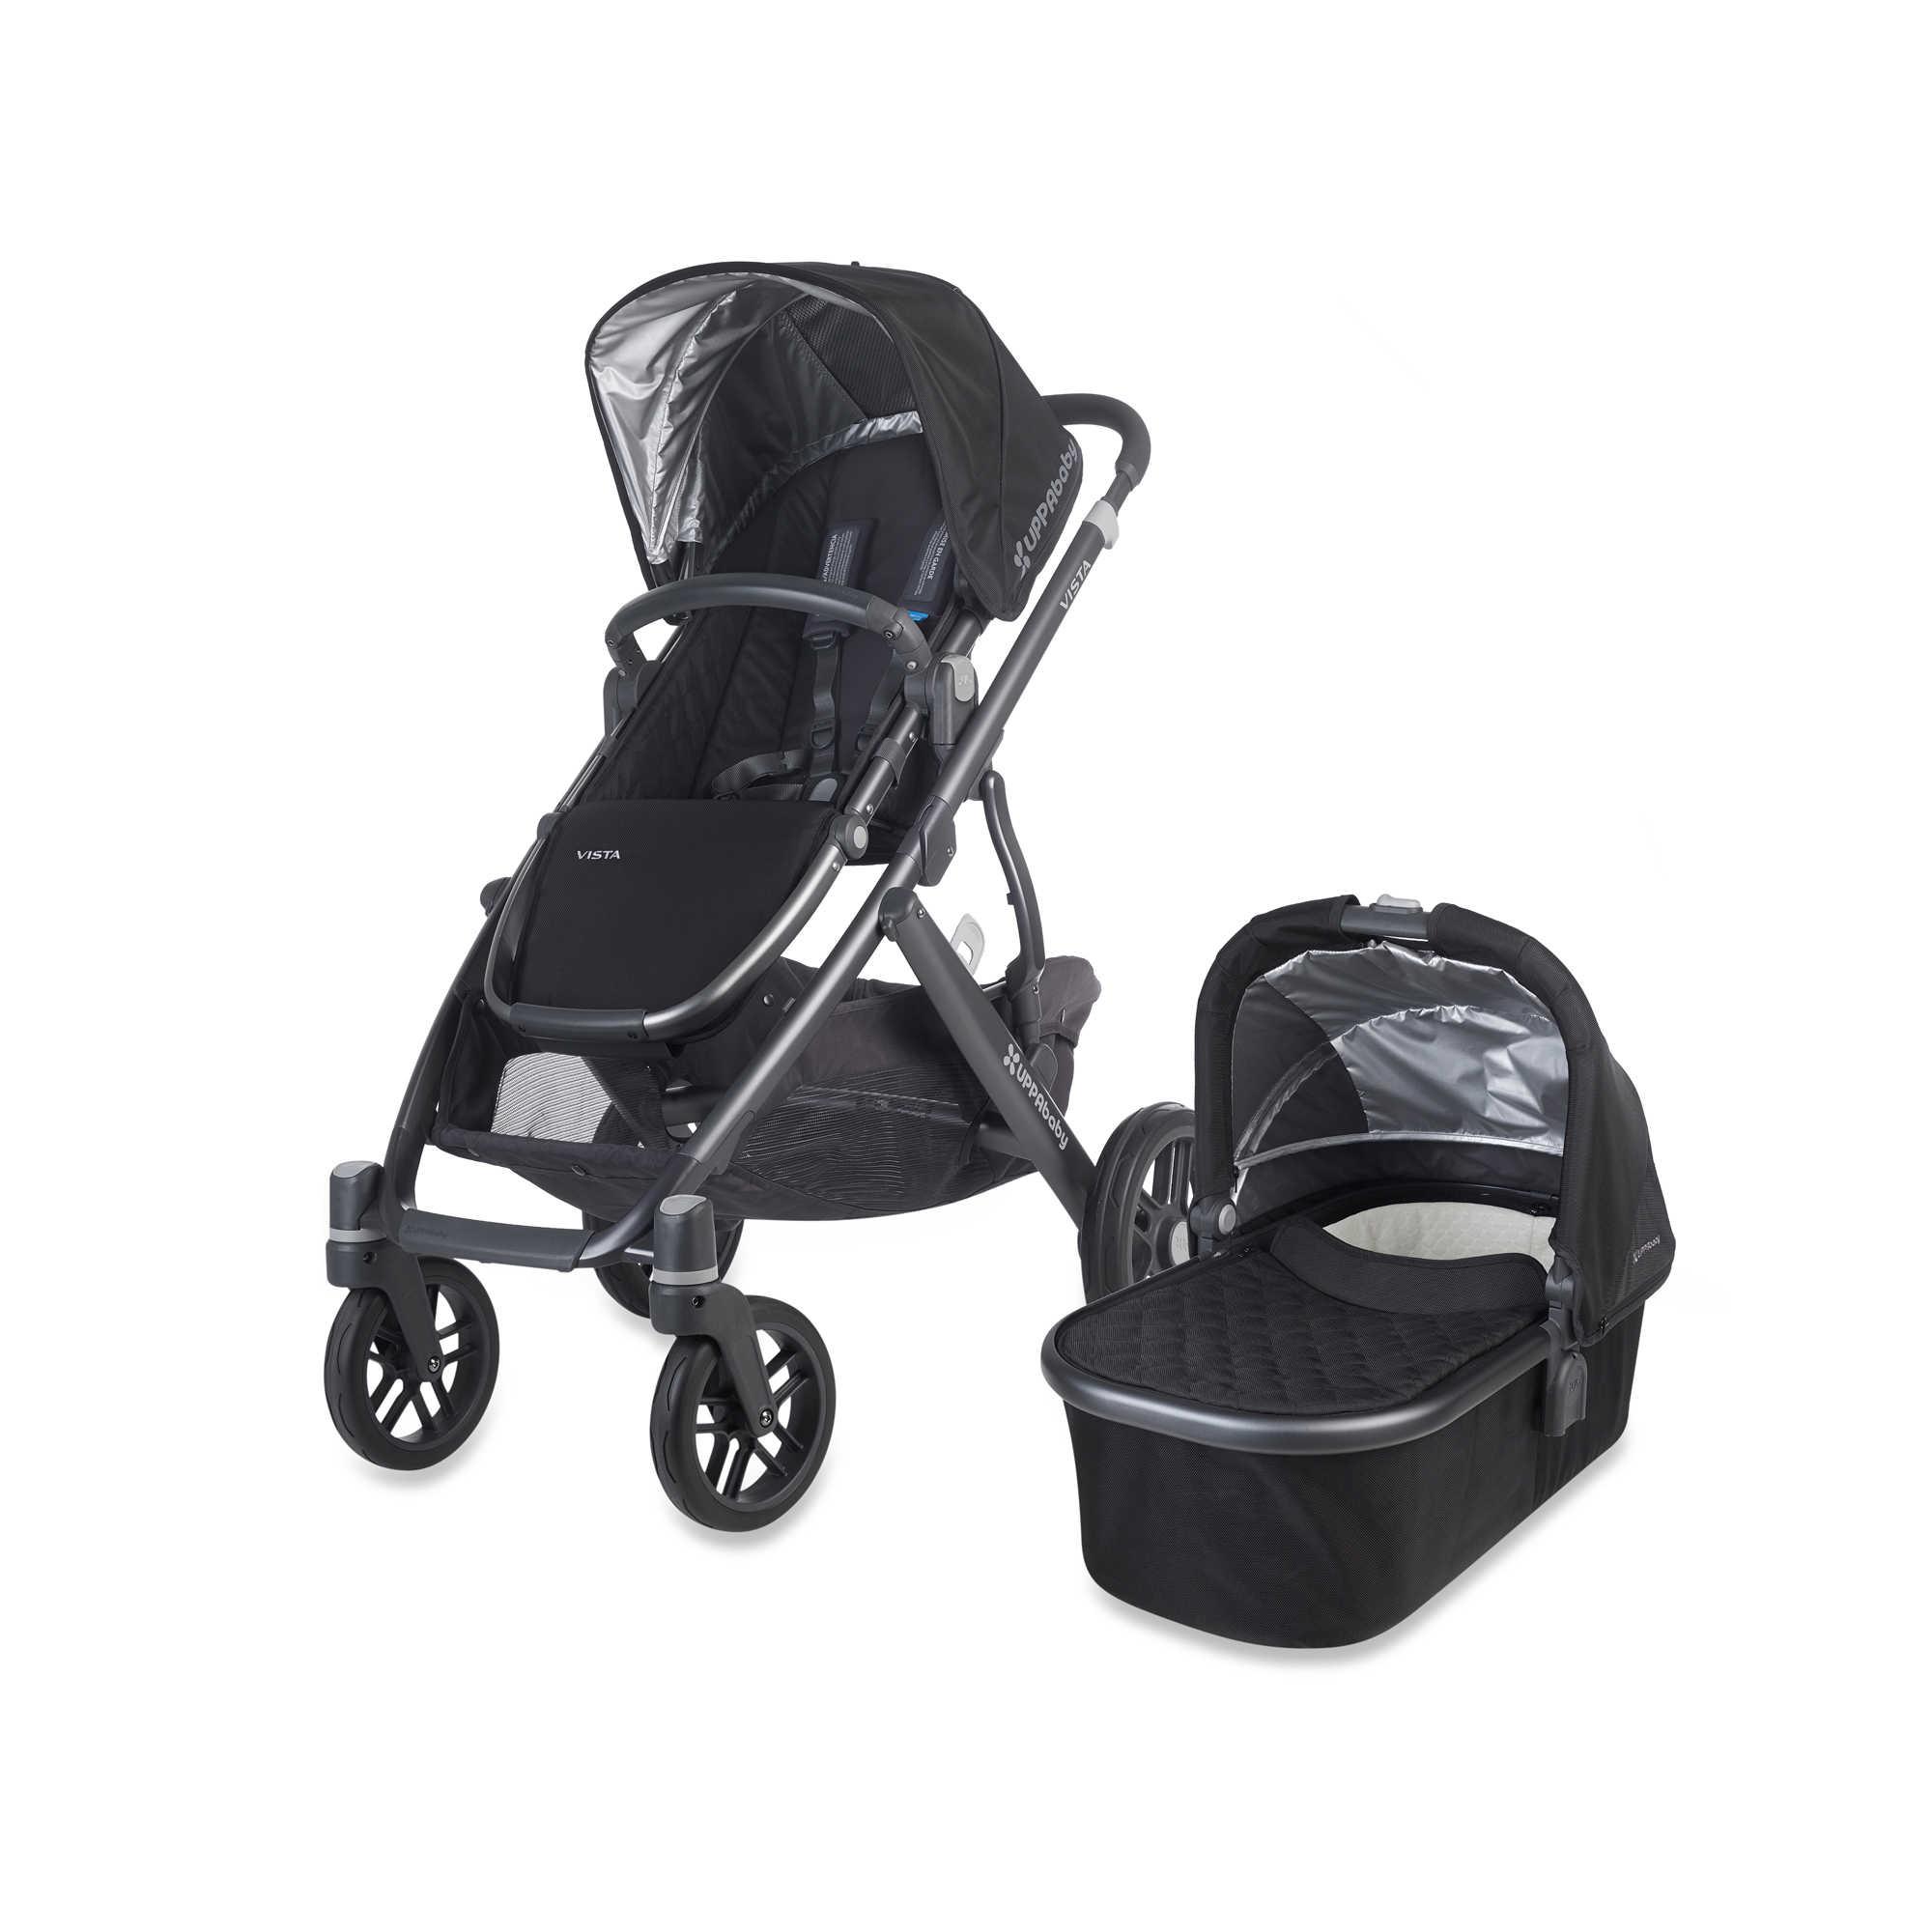 UPPAbaby VISTA Stroller - $703.99